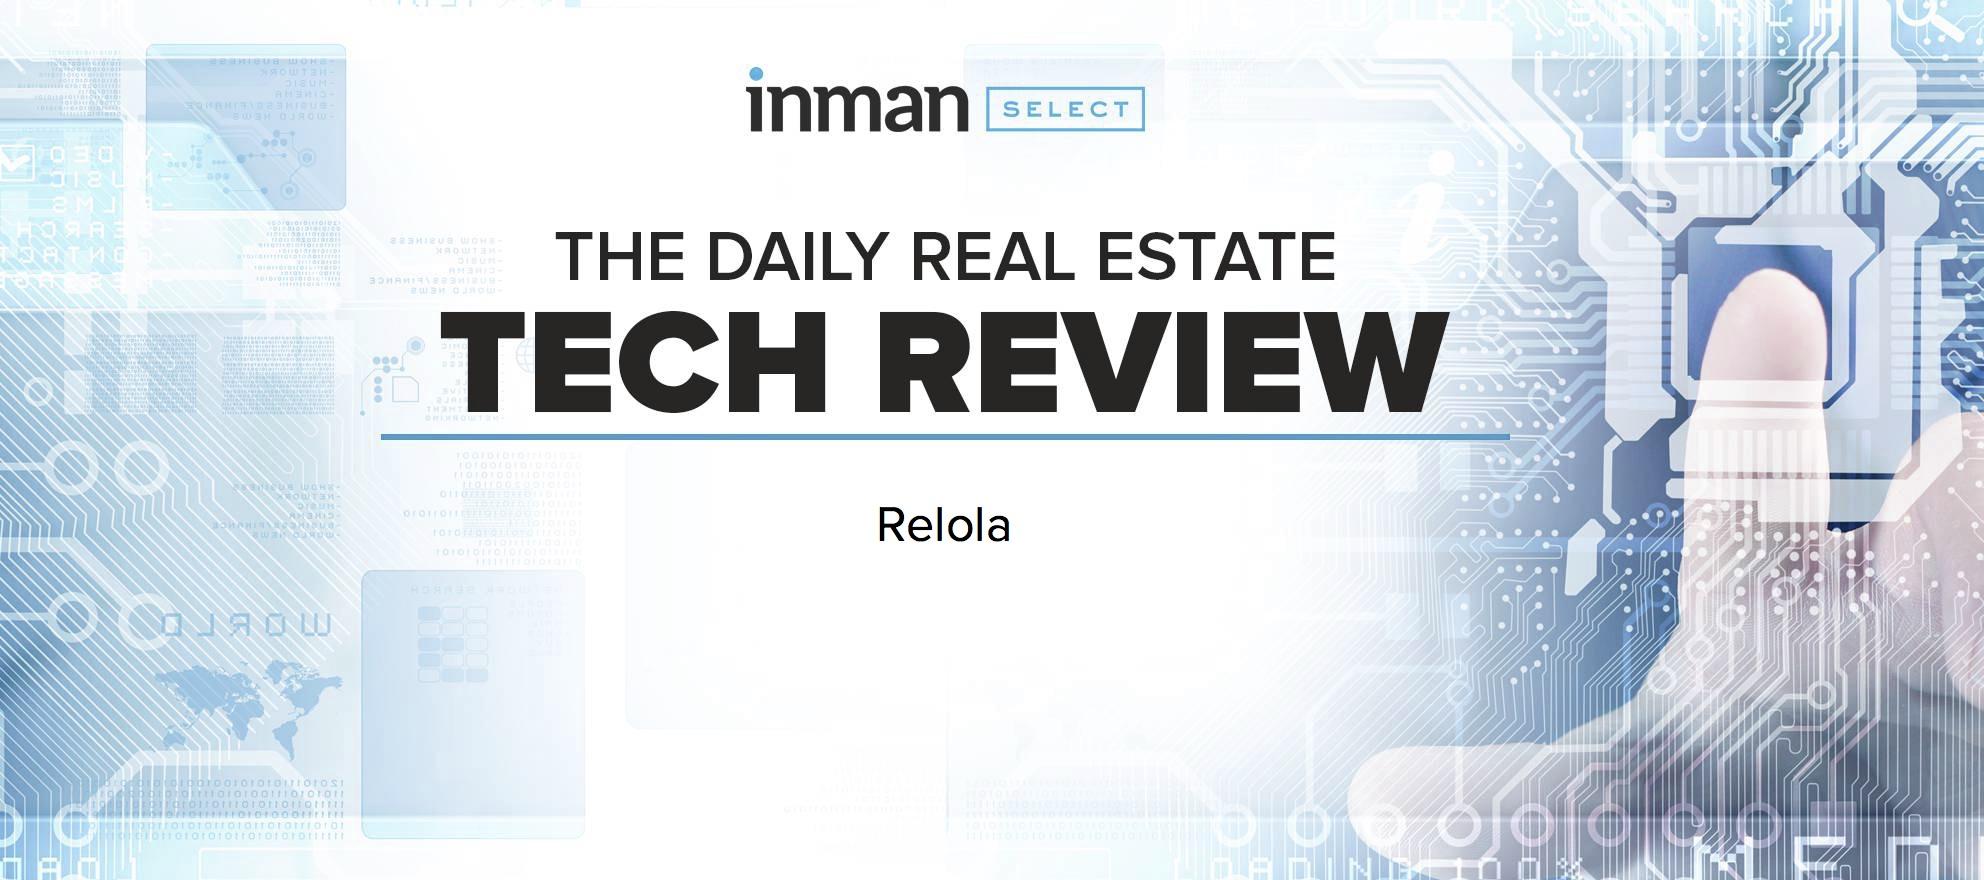 Relola: the property marketing platform for the sharing economy